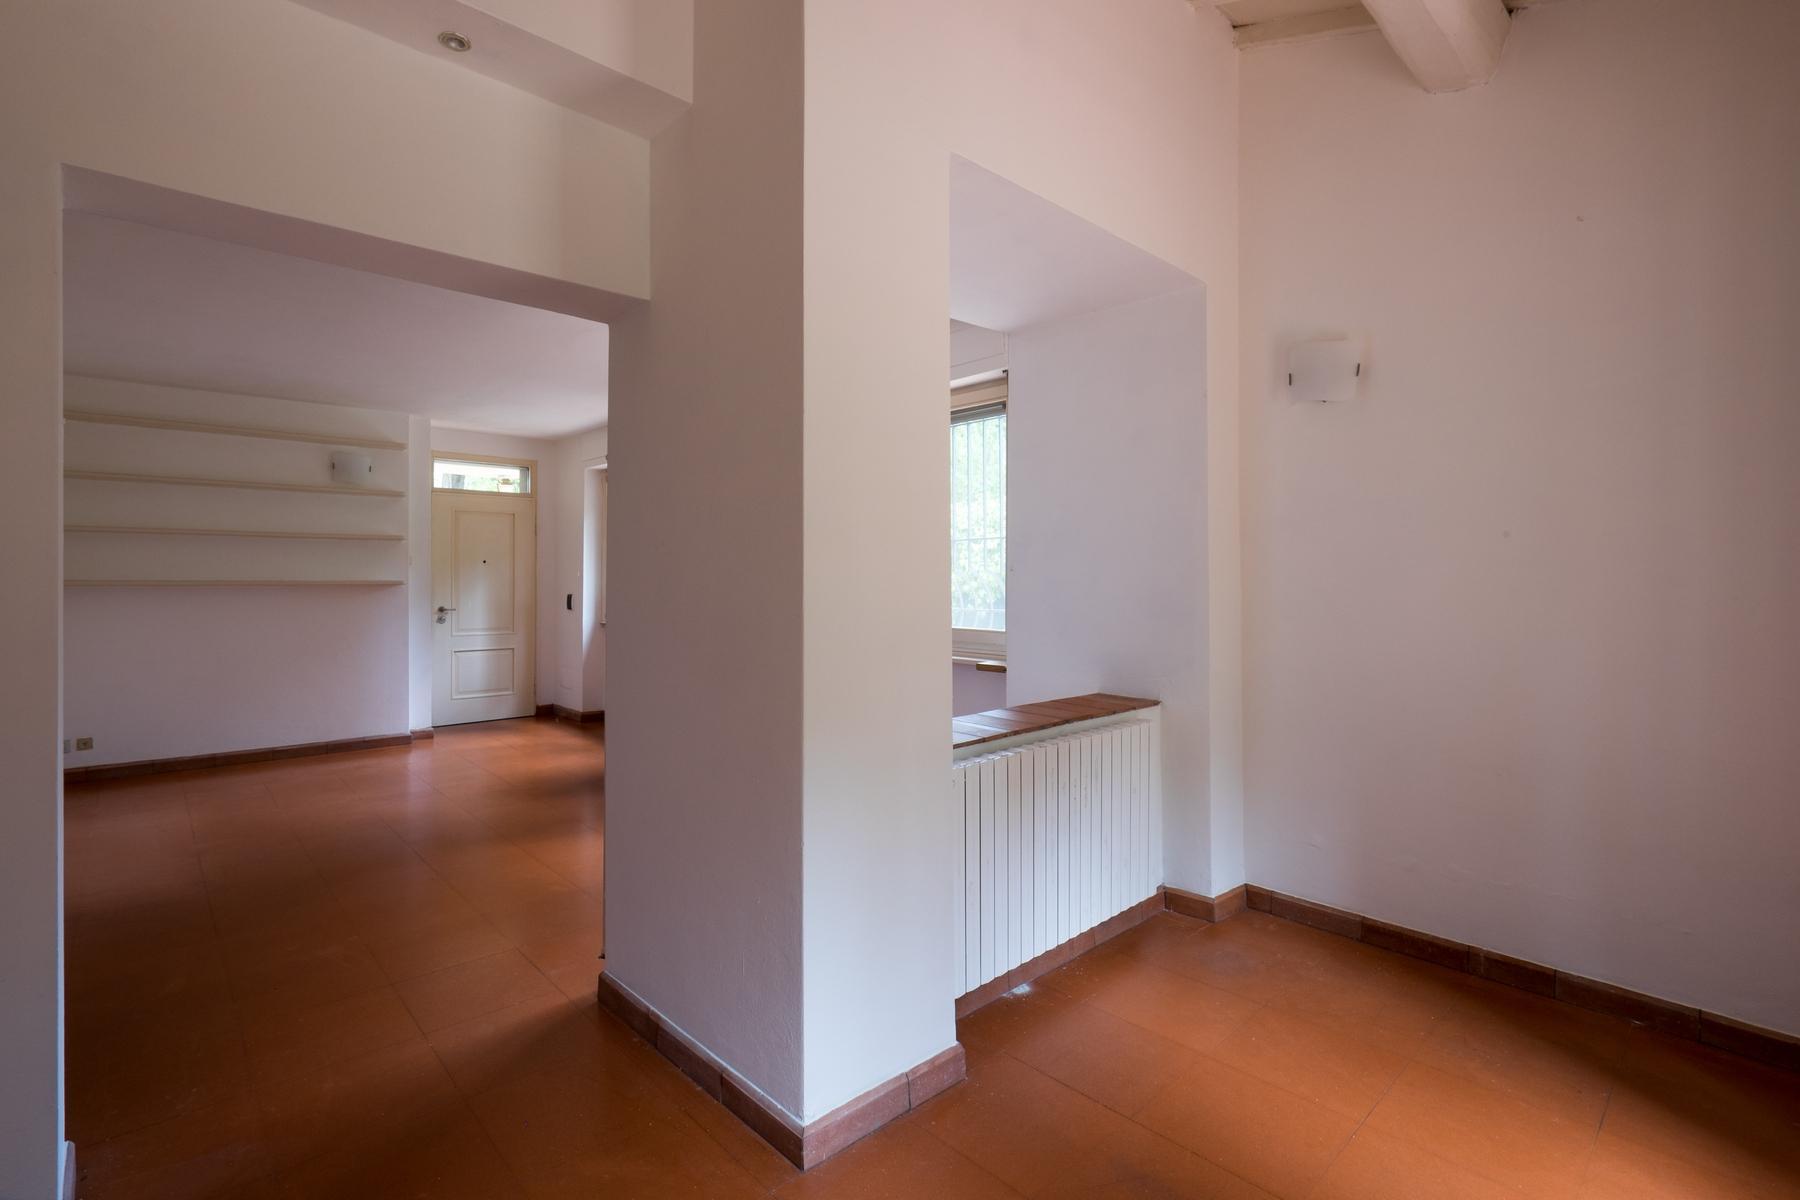 Schöne Wohnung in Poggio Imperiale - 5